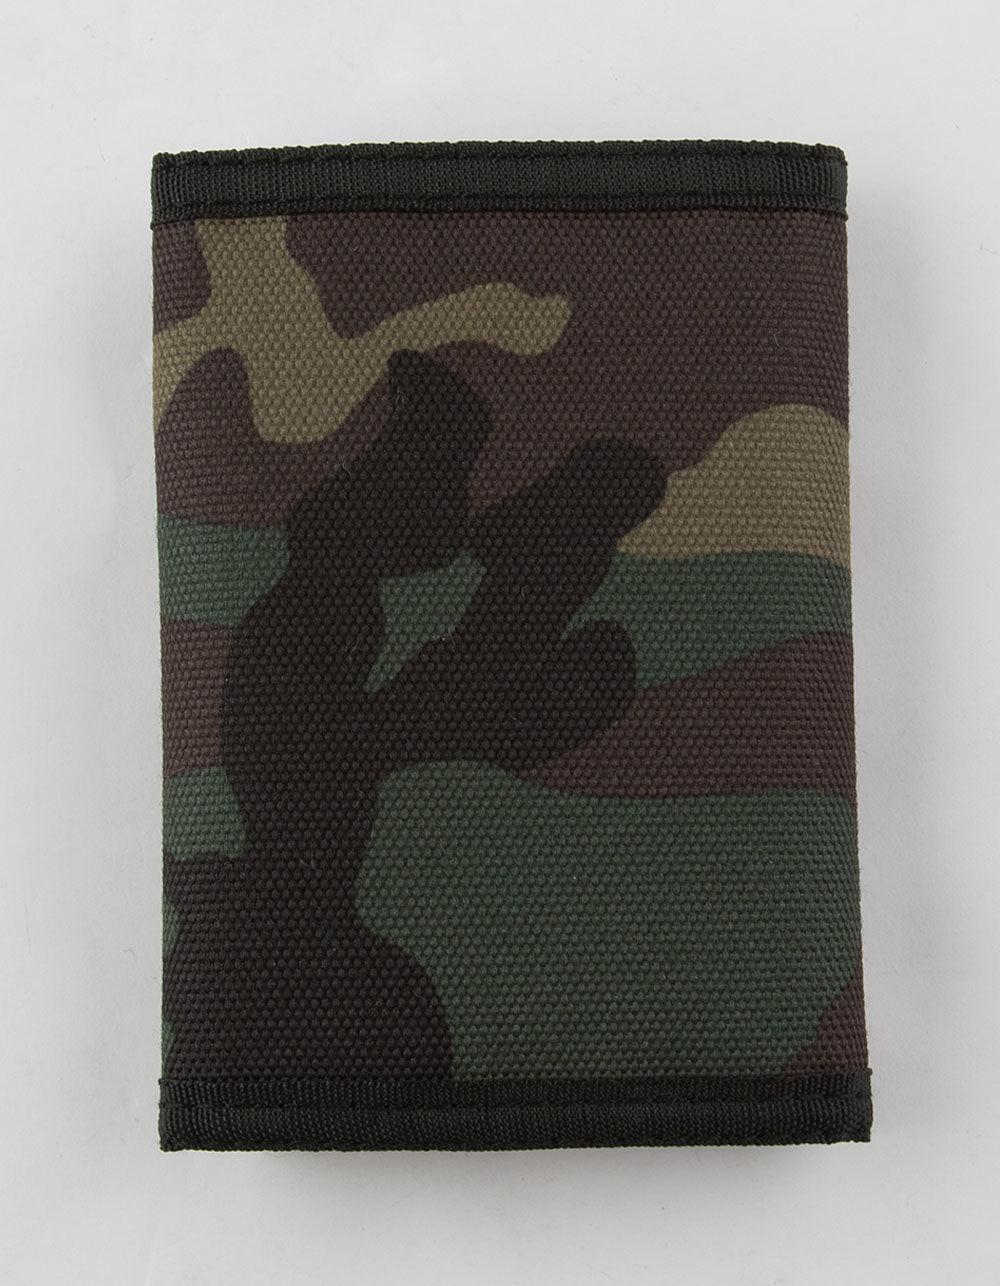 bac488d8f84913 Lyst - Vans Slipped Camo Wallet for Men